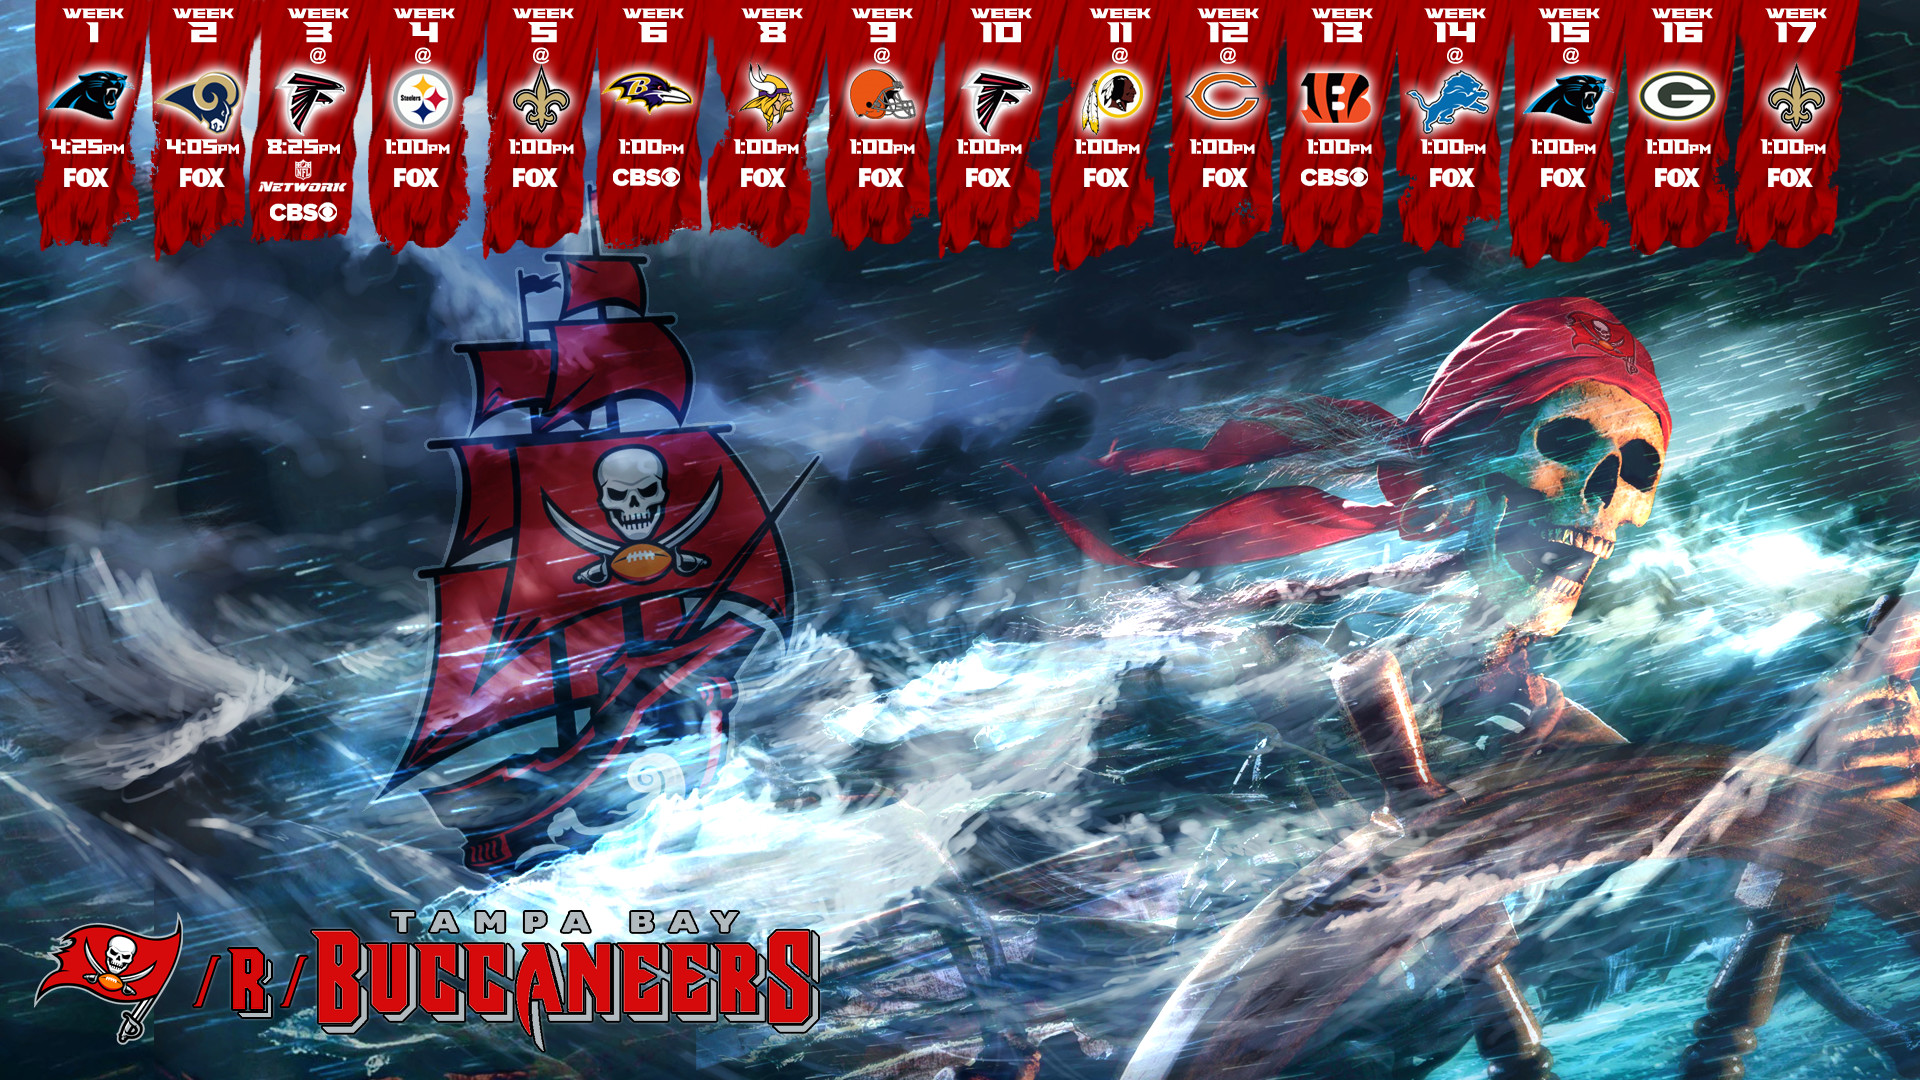 Tampa Bay Buccaneers Wallpapers (52+